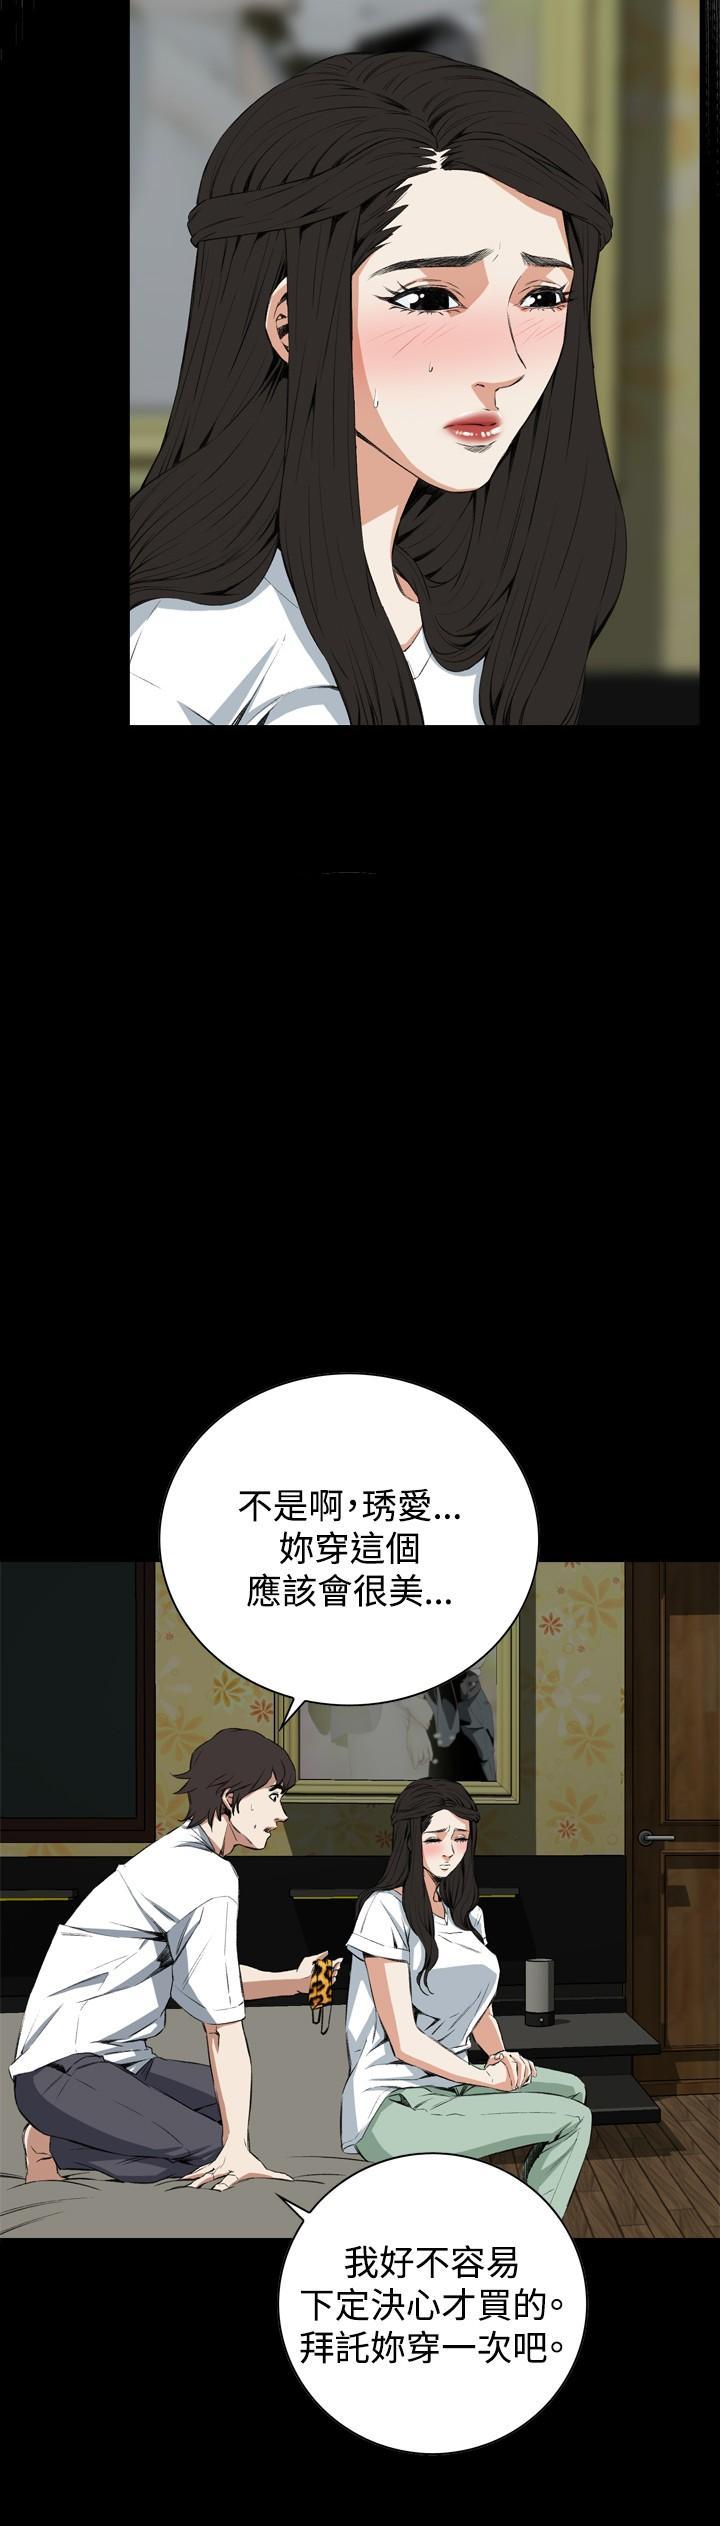 Take a Peek 偷窥 Ch.39~55 [Chinese]中文 423